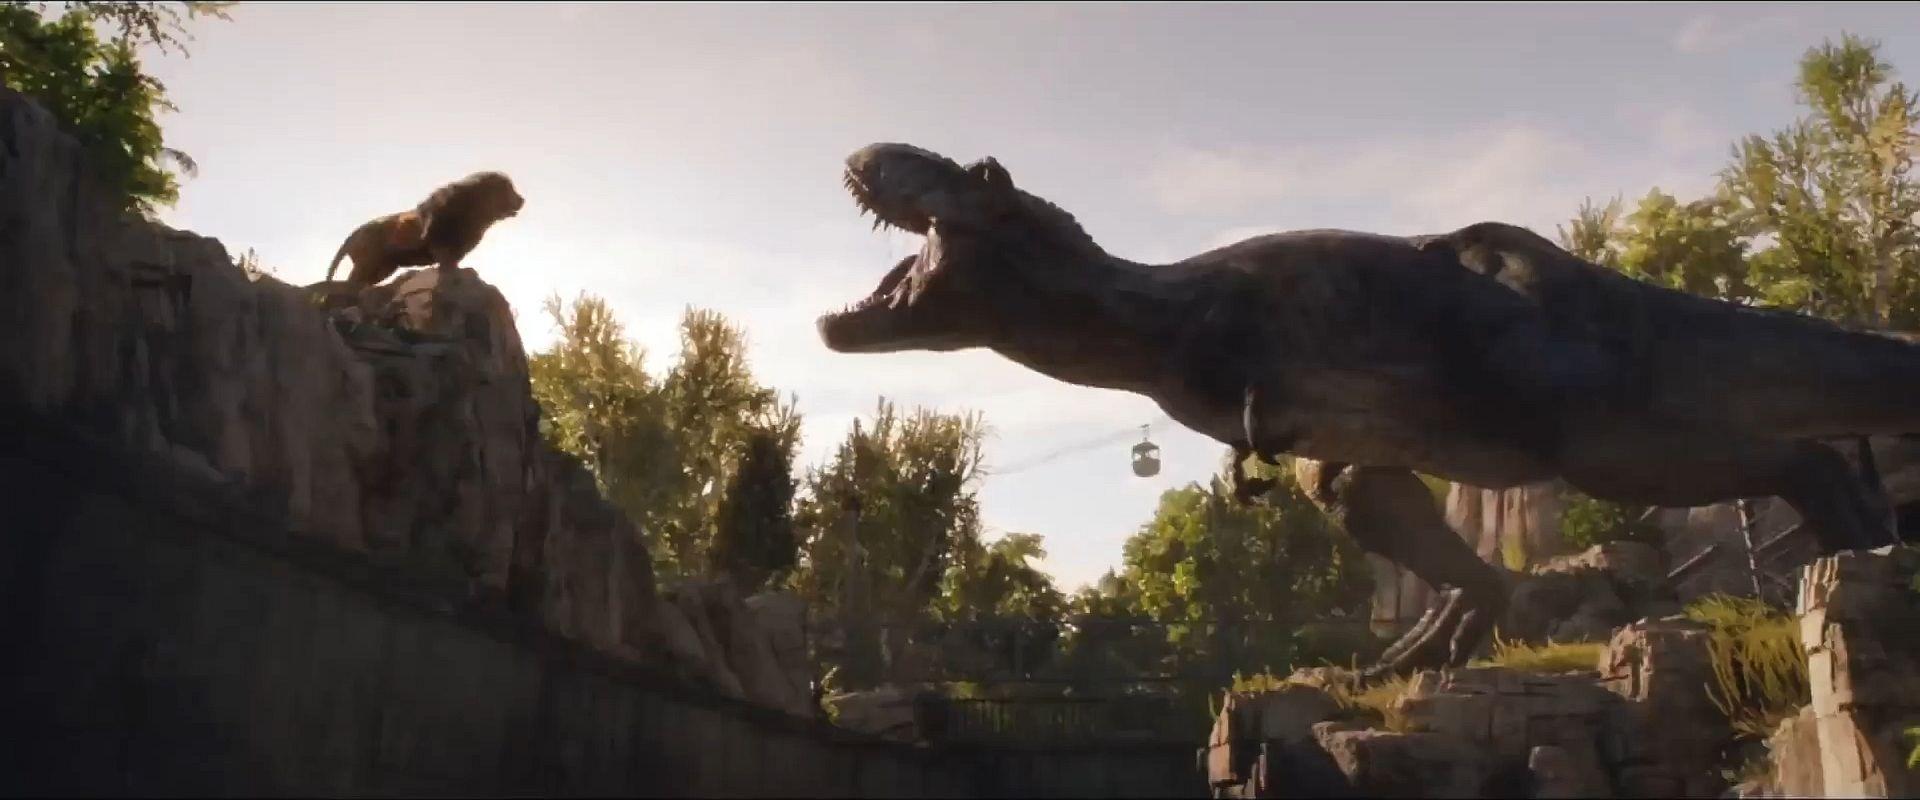 Jurassic World Fallen Kingdom-Lion Tyrannosaurus 1 by ...